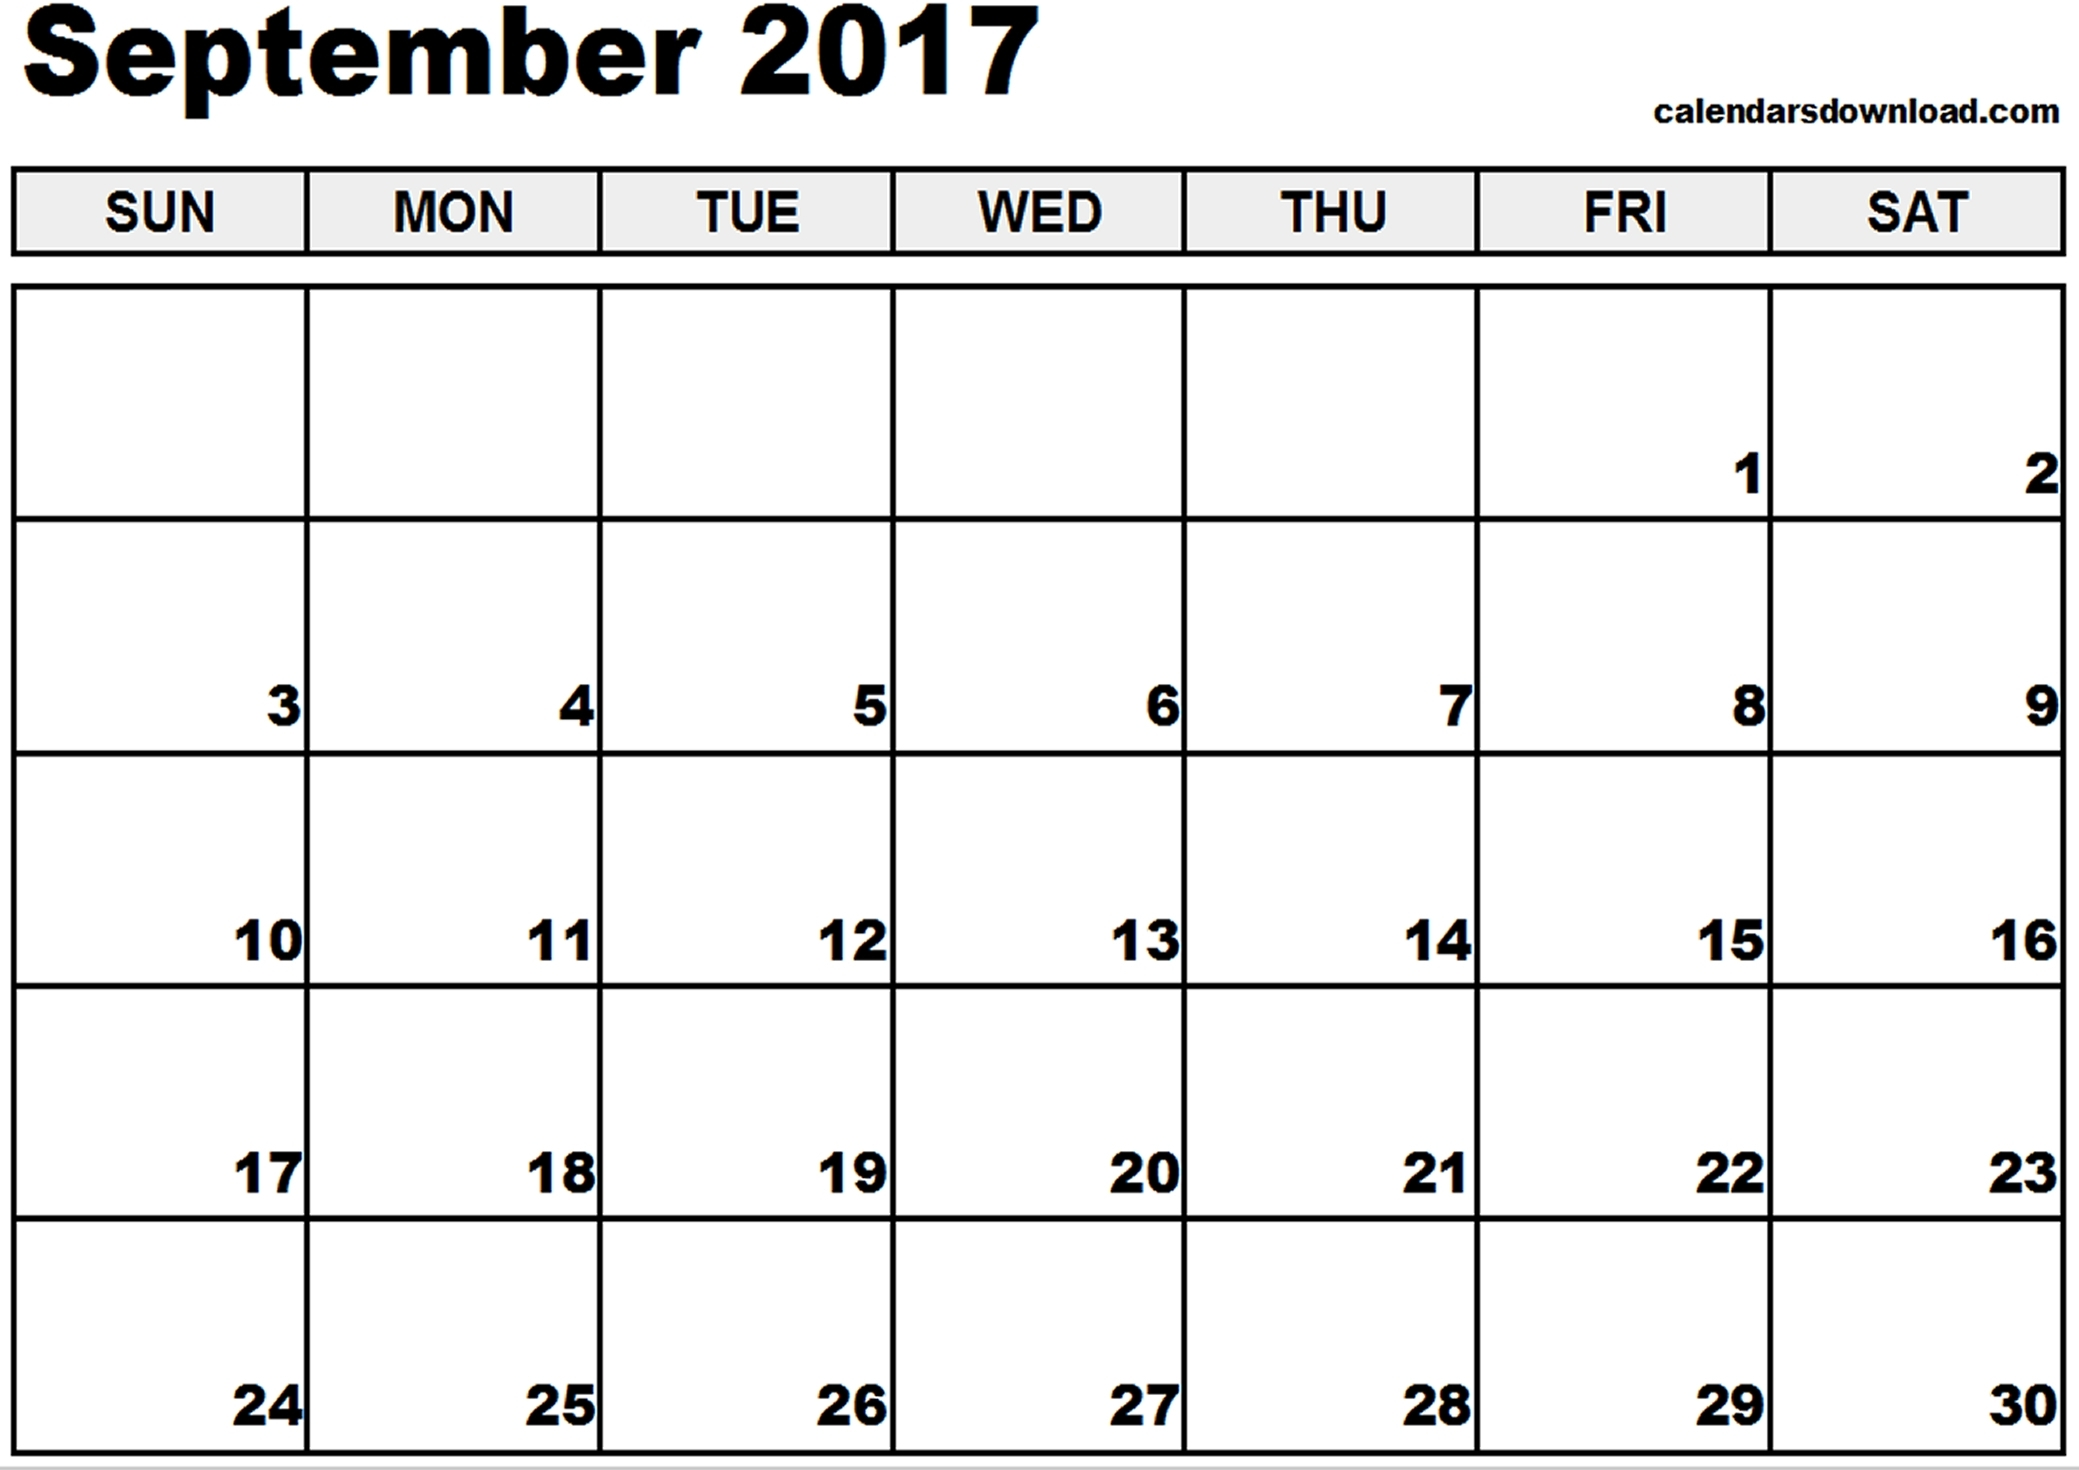 September 2017 Printable Calendar Pdf - Printable Calendar regarding Calendar For The Month Of September